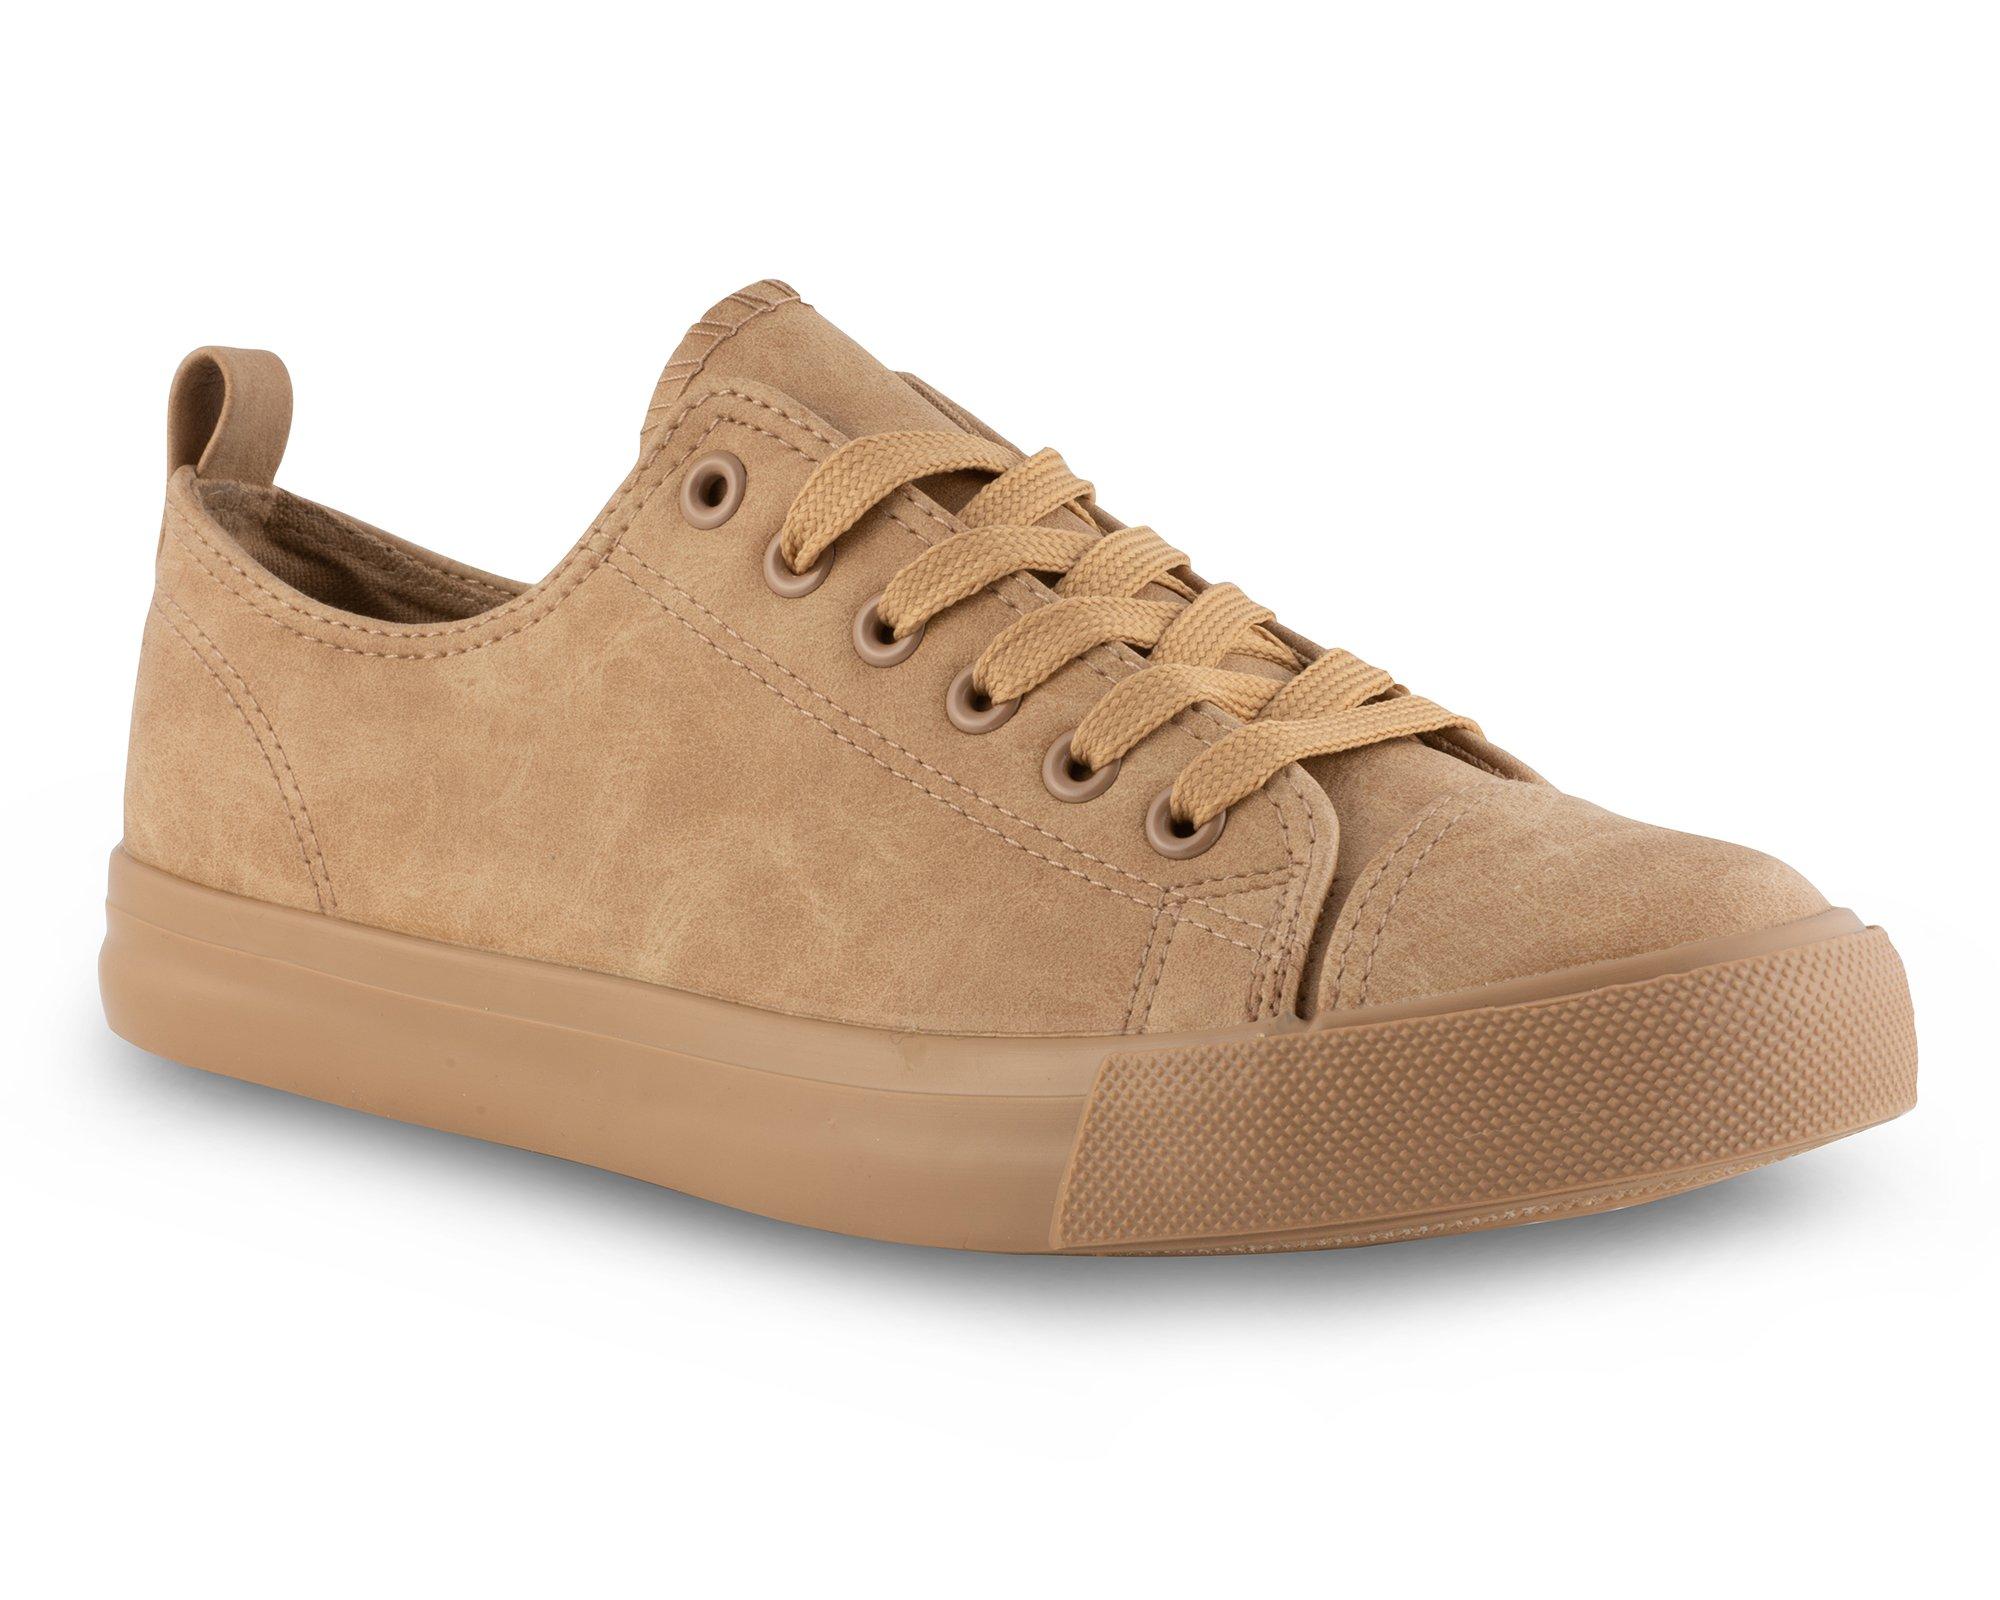 Twisted Women's Low Top Faux Leather Sneaker -KIXLO300 TAN, Size 7